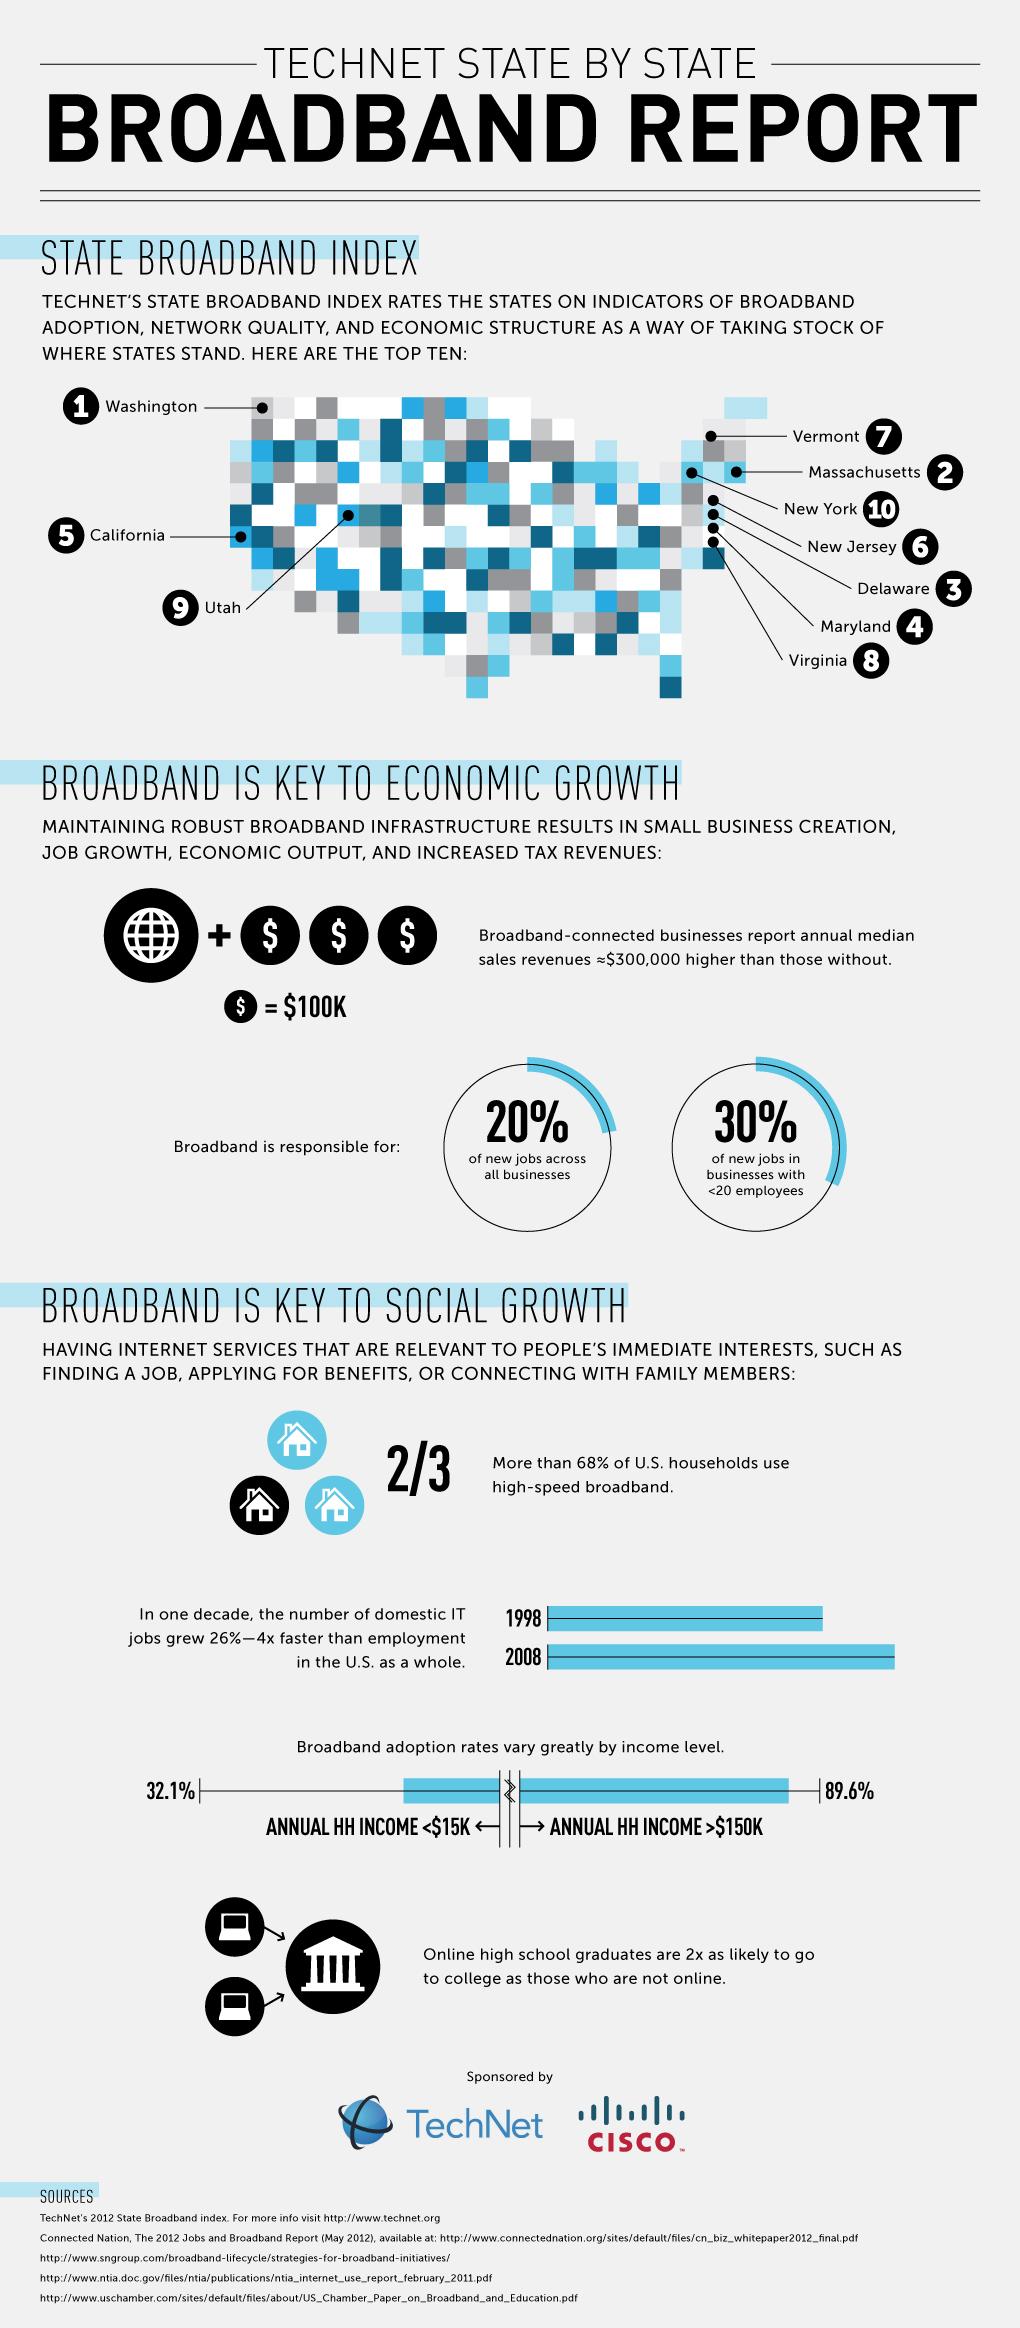 2012-12-05-StateBroadband_InfographicFINAL1.jpg